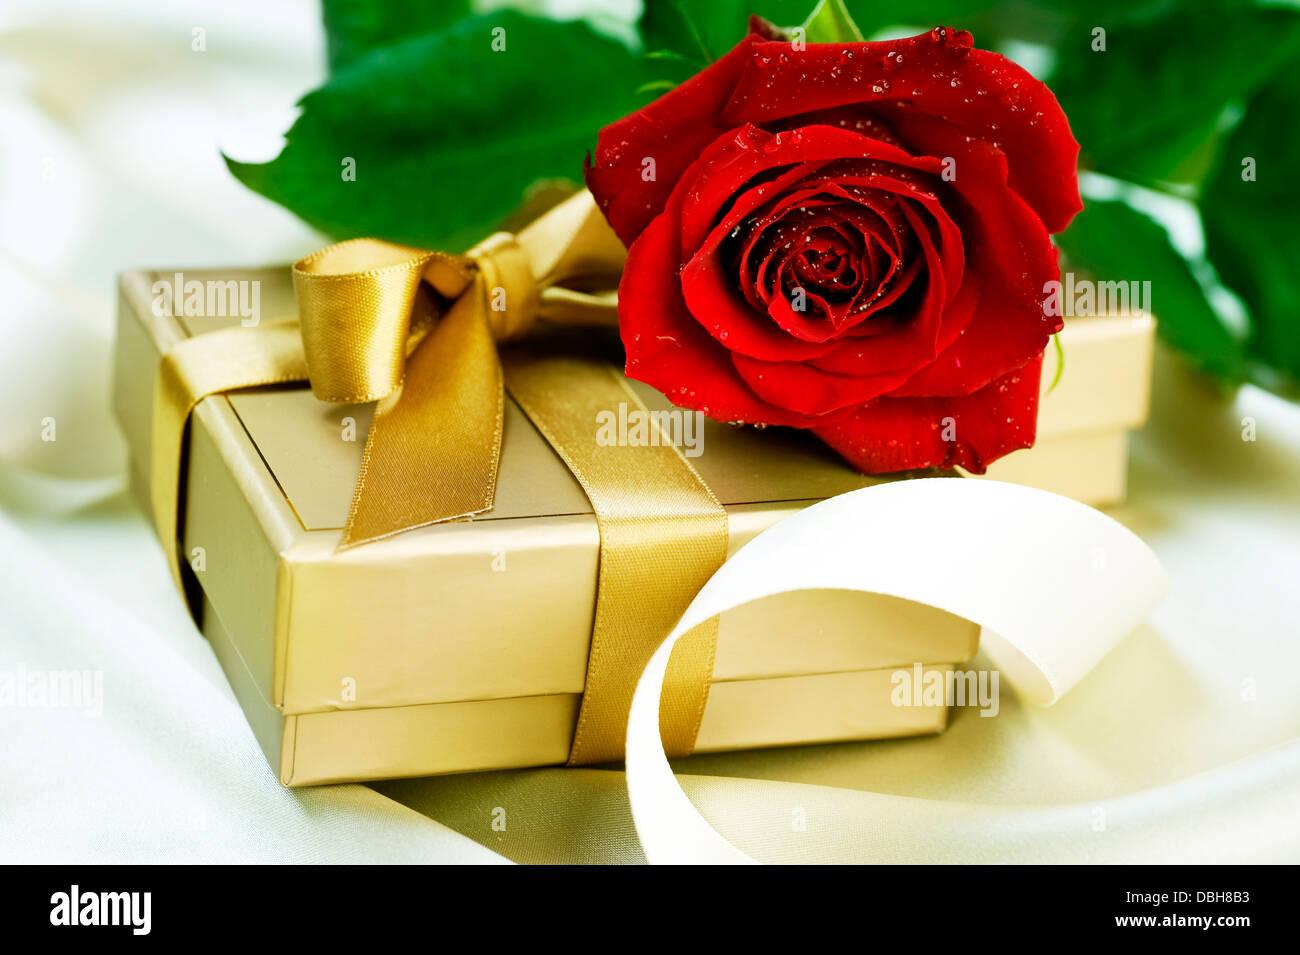 San Valentín Imagen De Stock